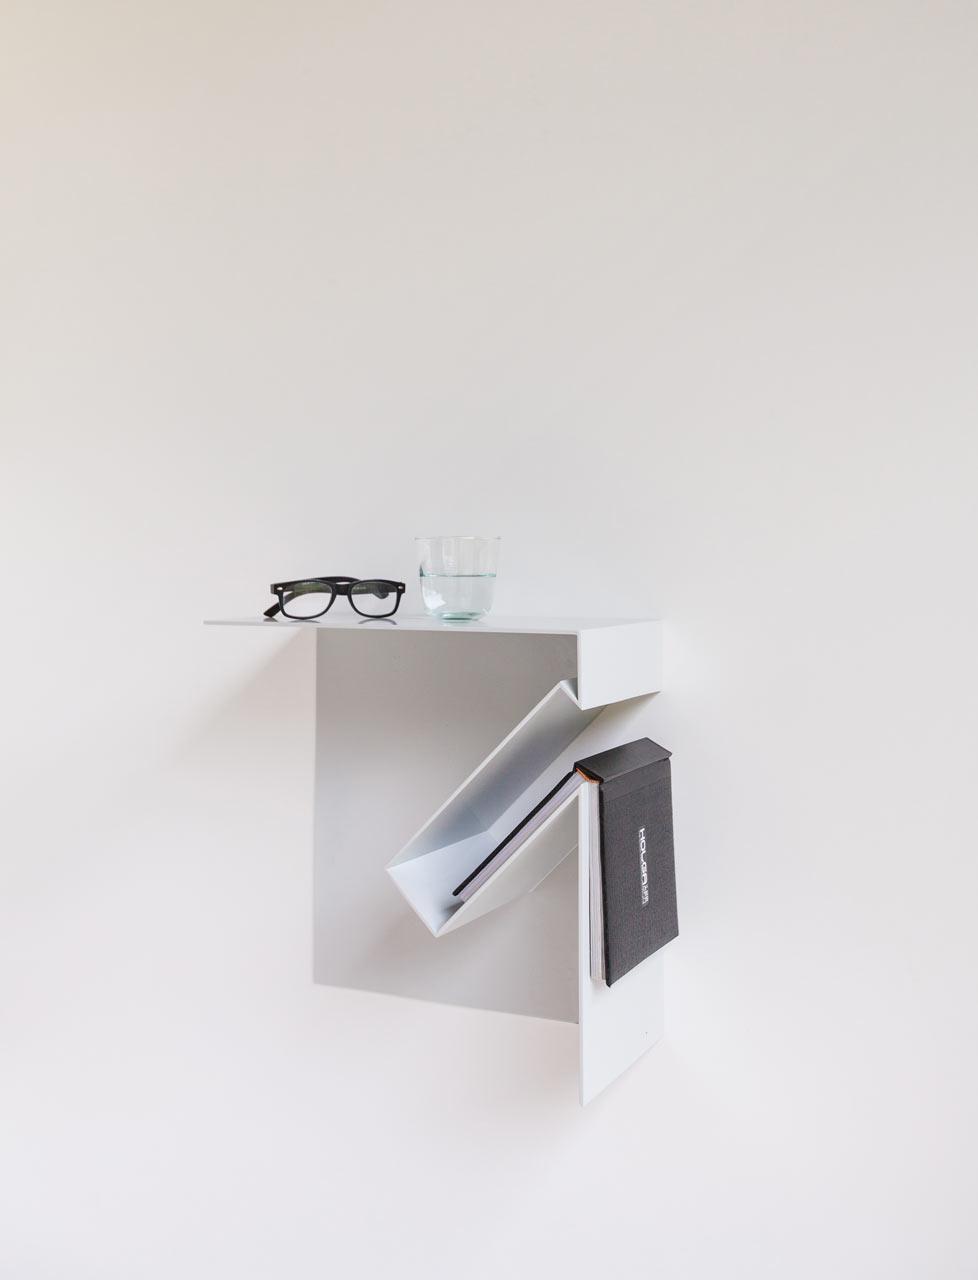 Filip-Janssens-Oblique-bookshelves-hisheji (9)